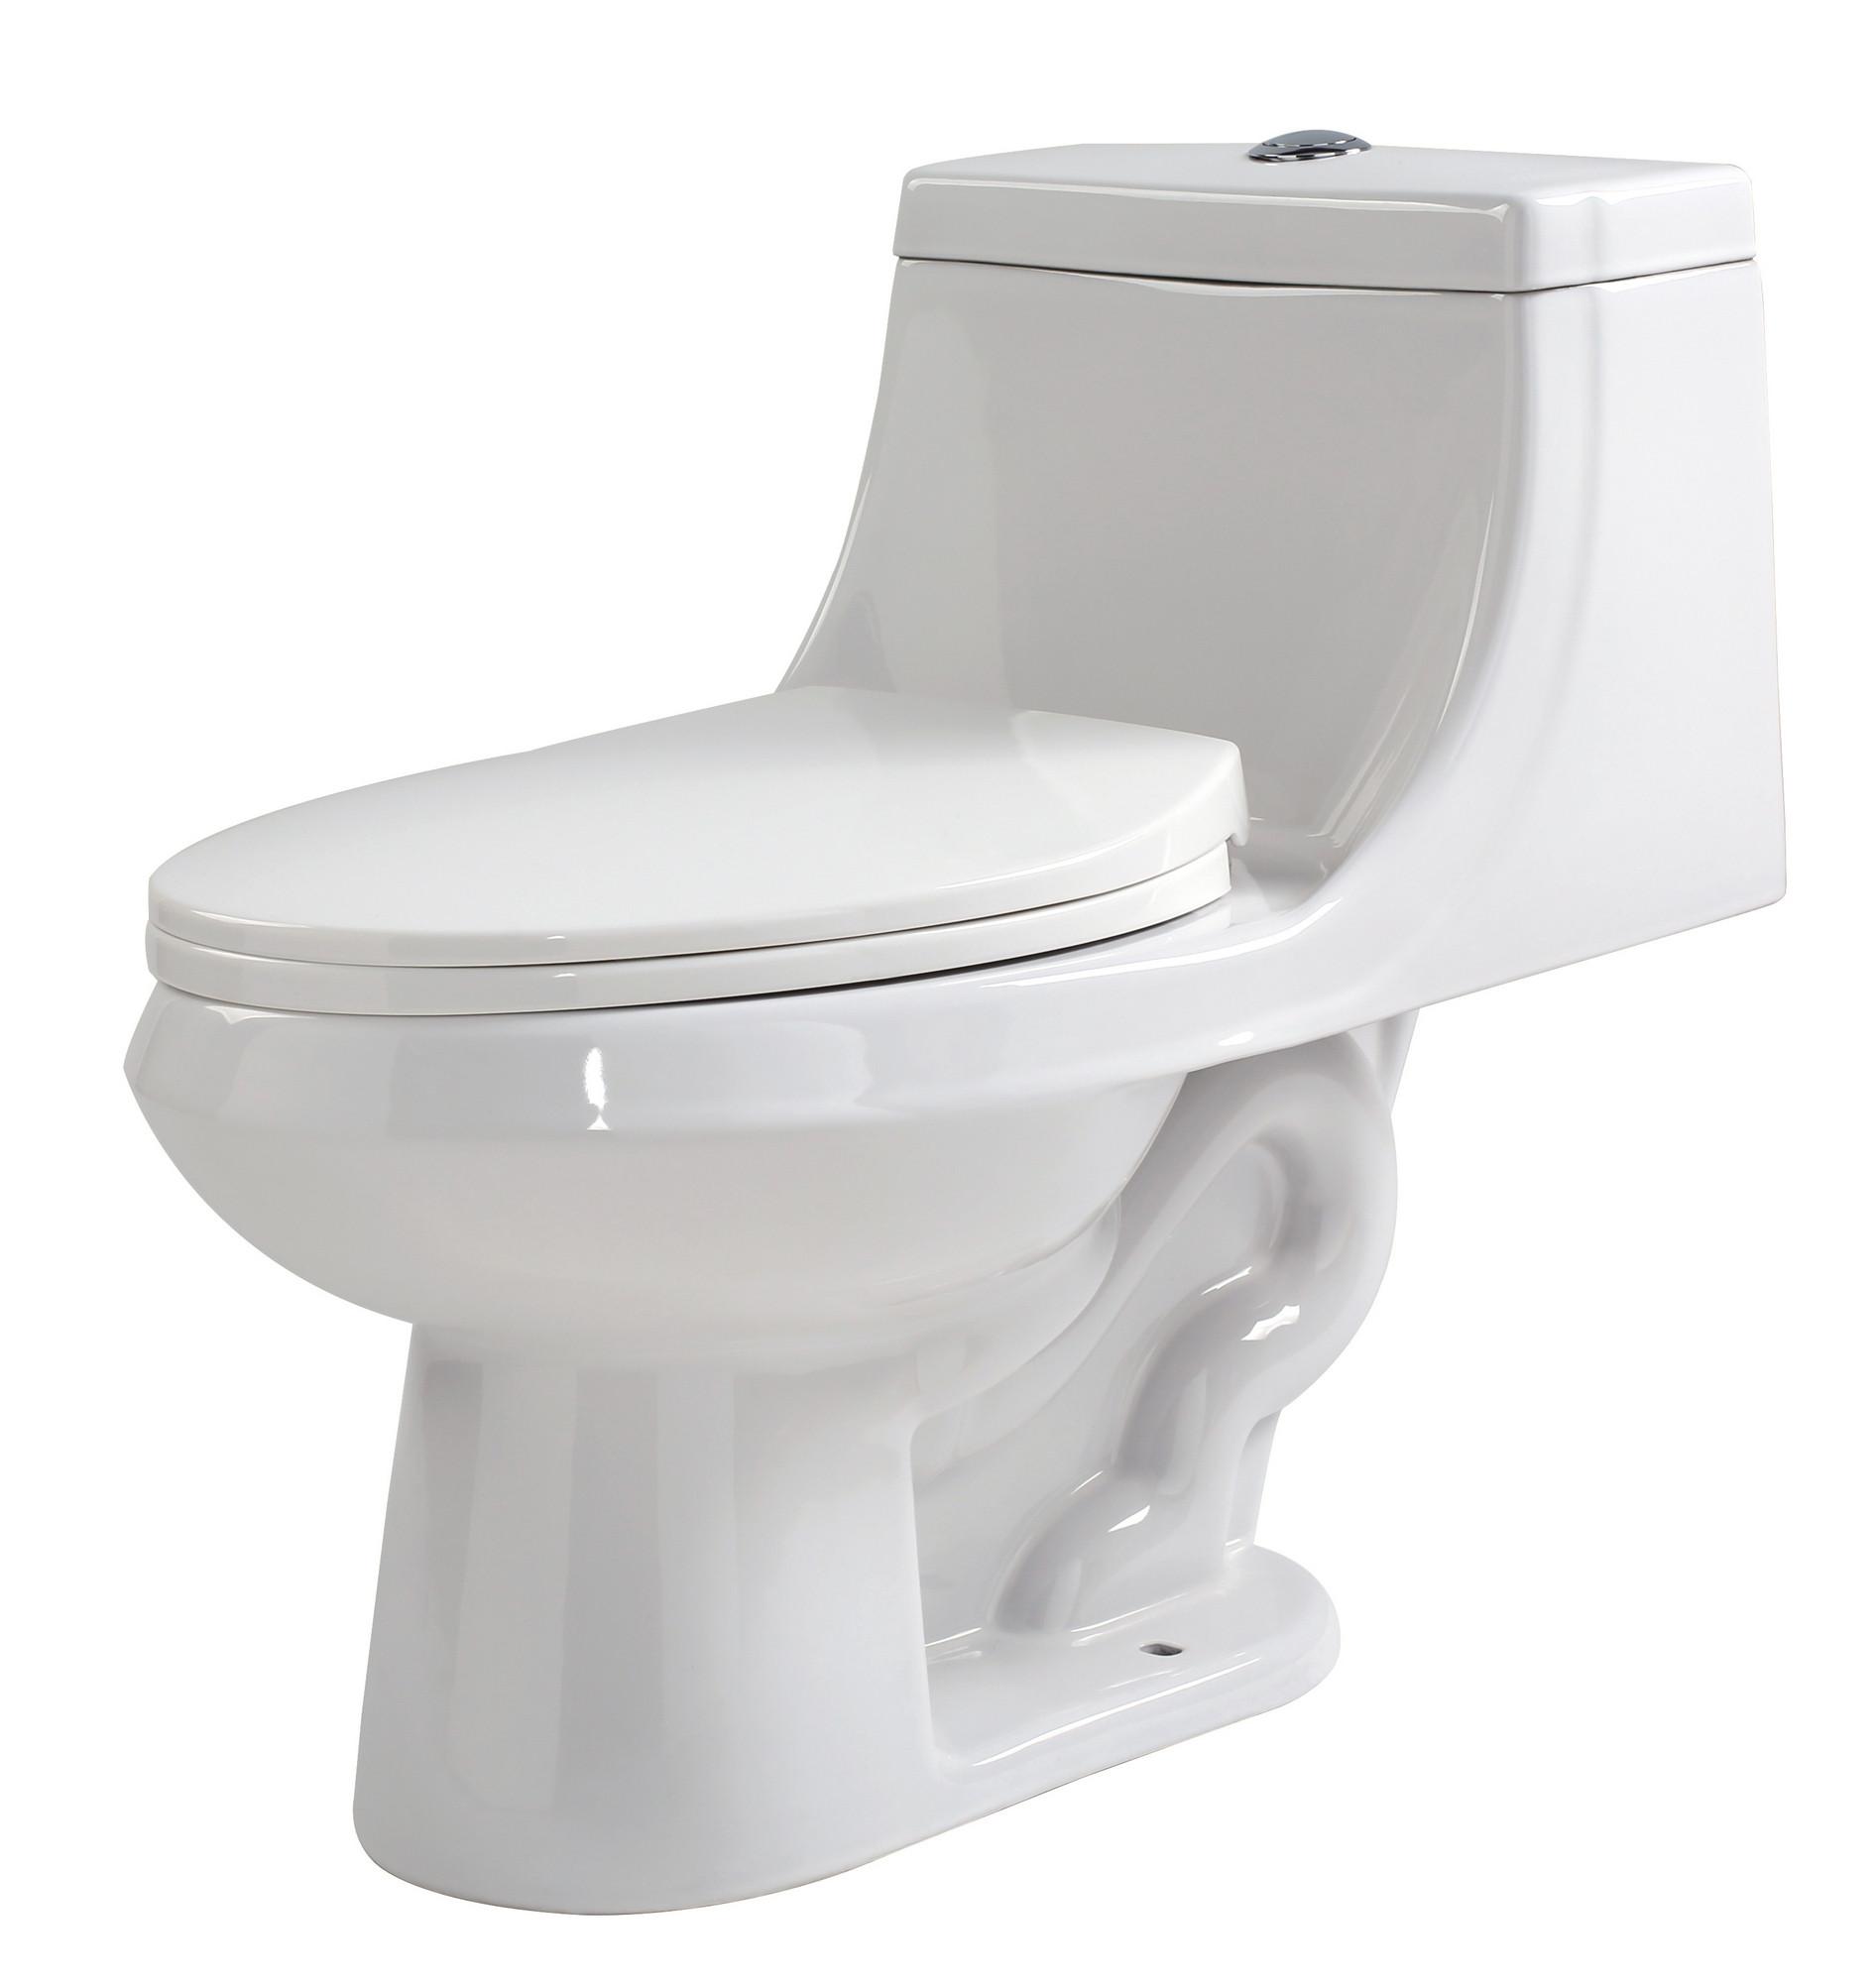 ANZZI T1-AZ056 Odin 1 Piece 1.28 GPF Dual Flush Elongated Toilet In White